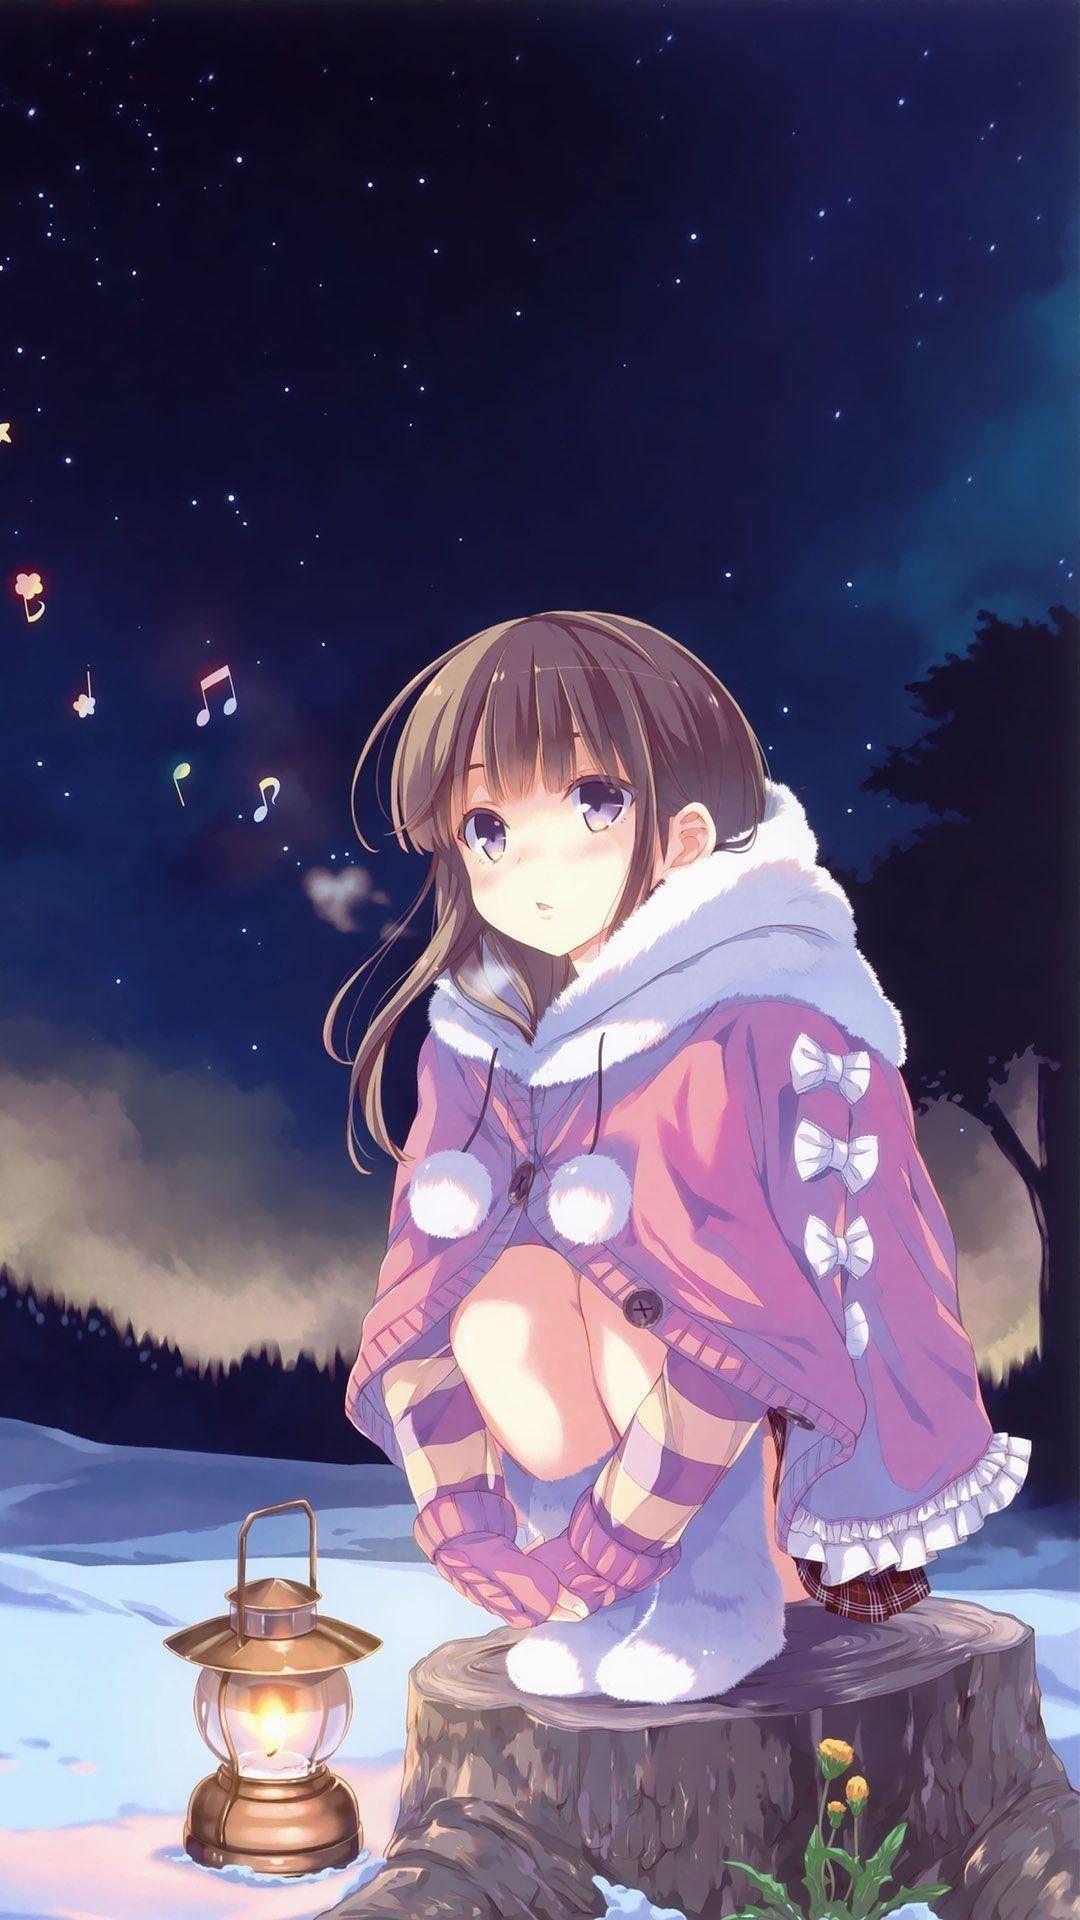 Anime Girl Phone Wallpapers - Top Free Anime Girl Phone ...